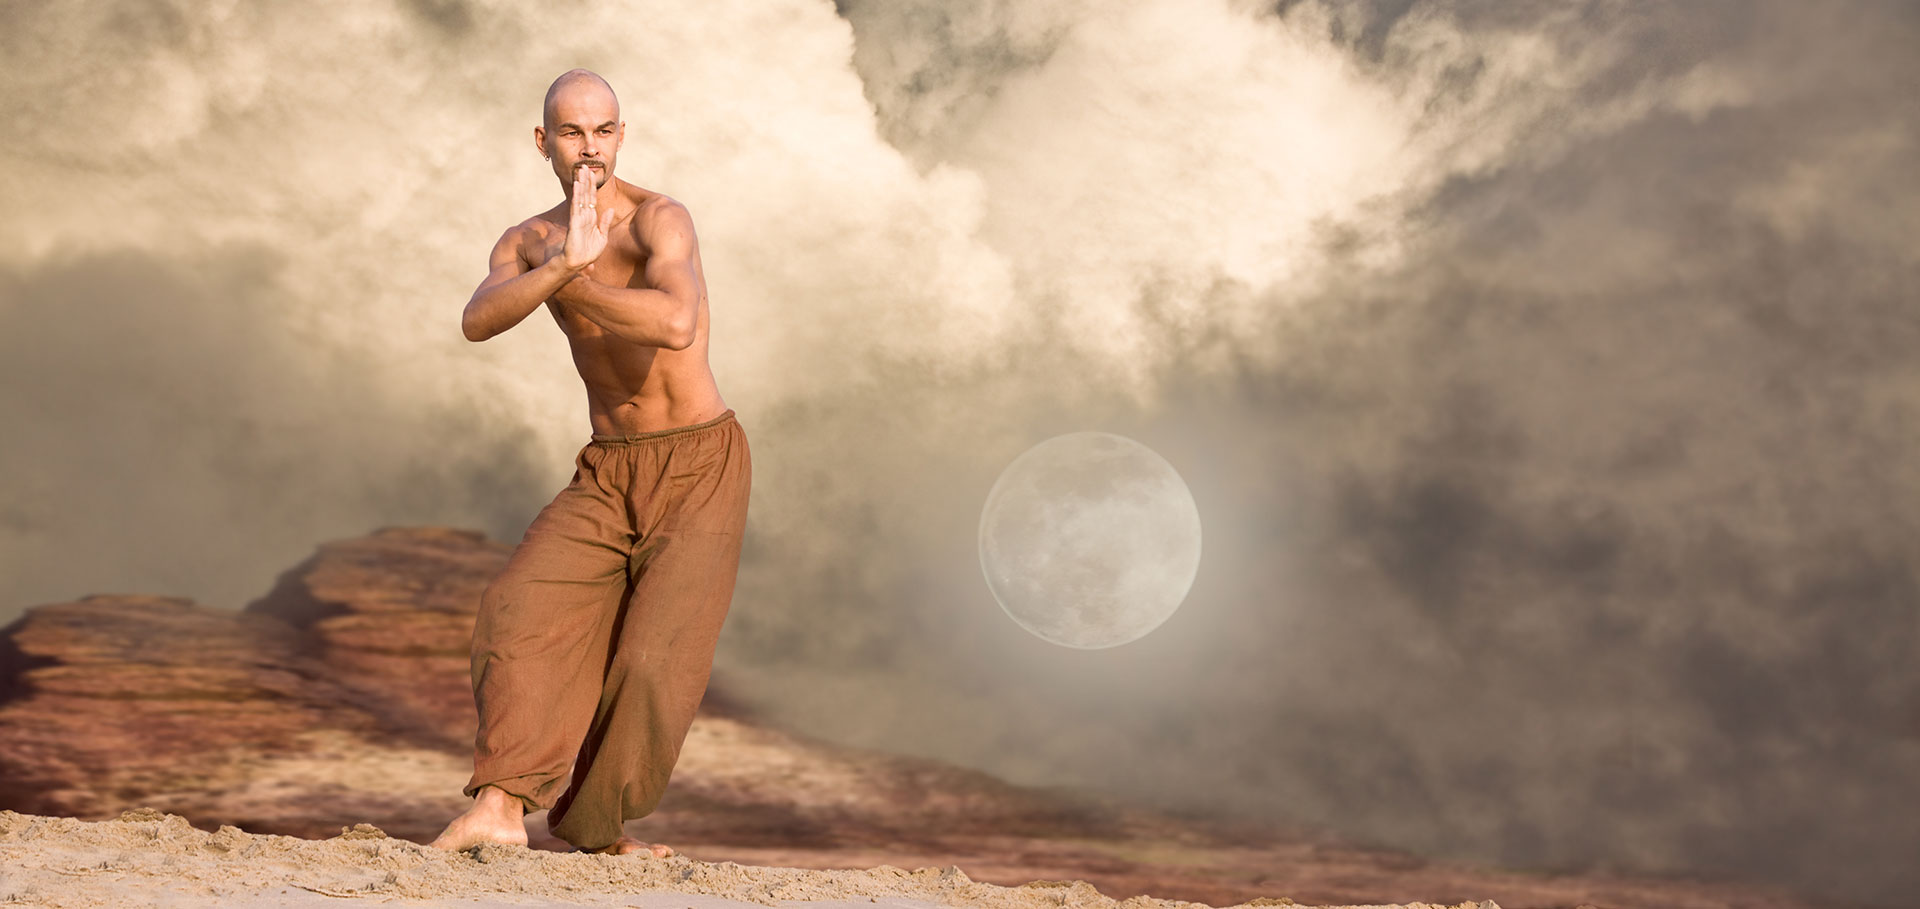 To Τai Chi Chuan είναι μια πολεμική τέχνη ήπιας έντασης η όποια πολλές φόρες χρησιμοποιείται και για θεραπευτικούς σκοπούς.